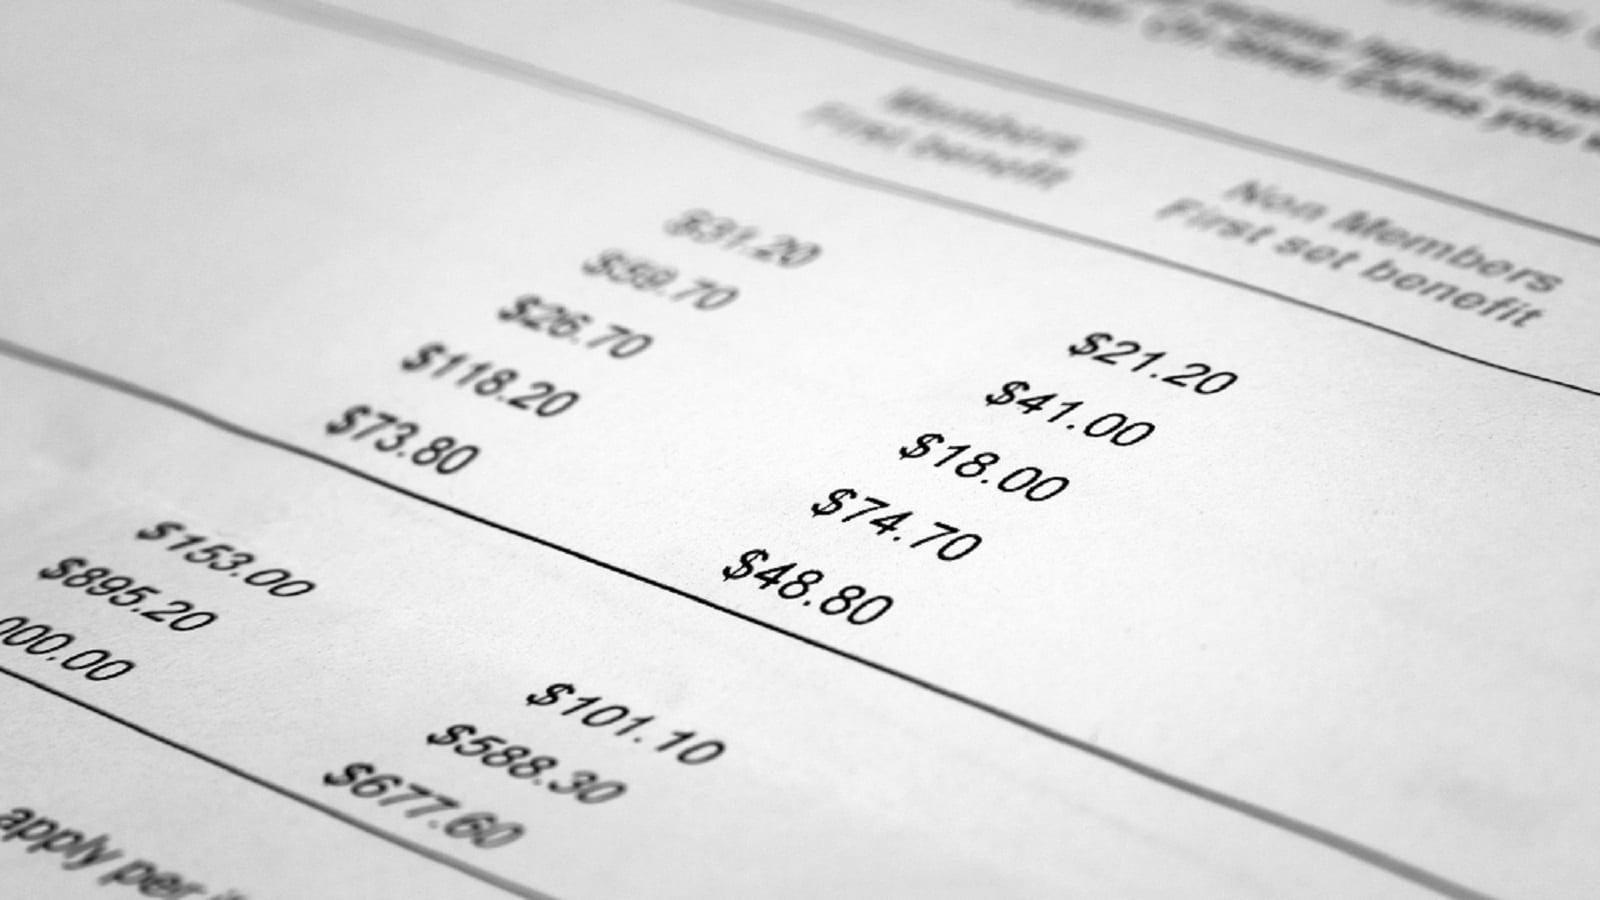 Medical Insurance Billing Statement